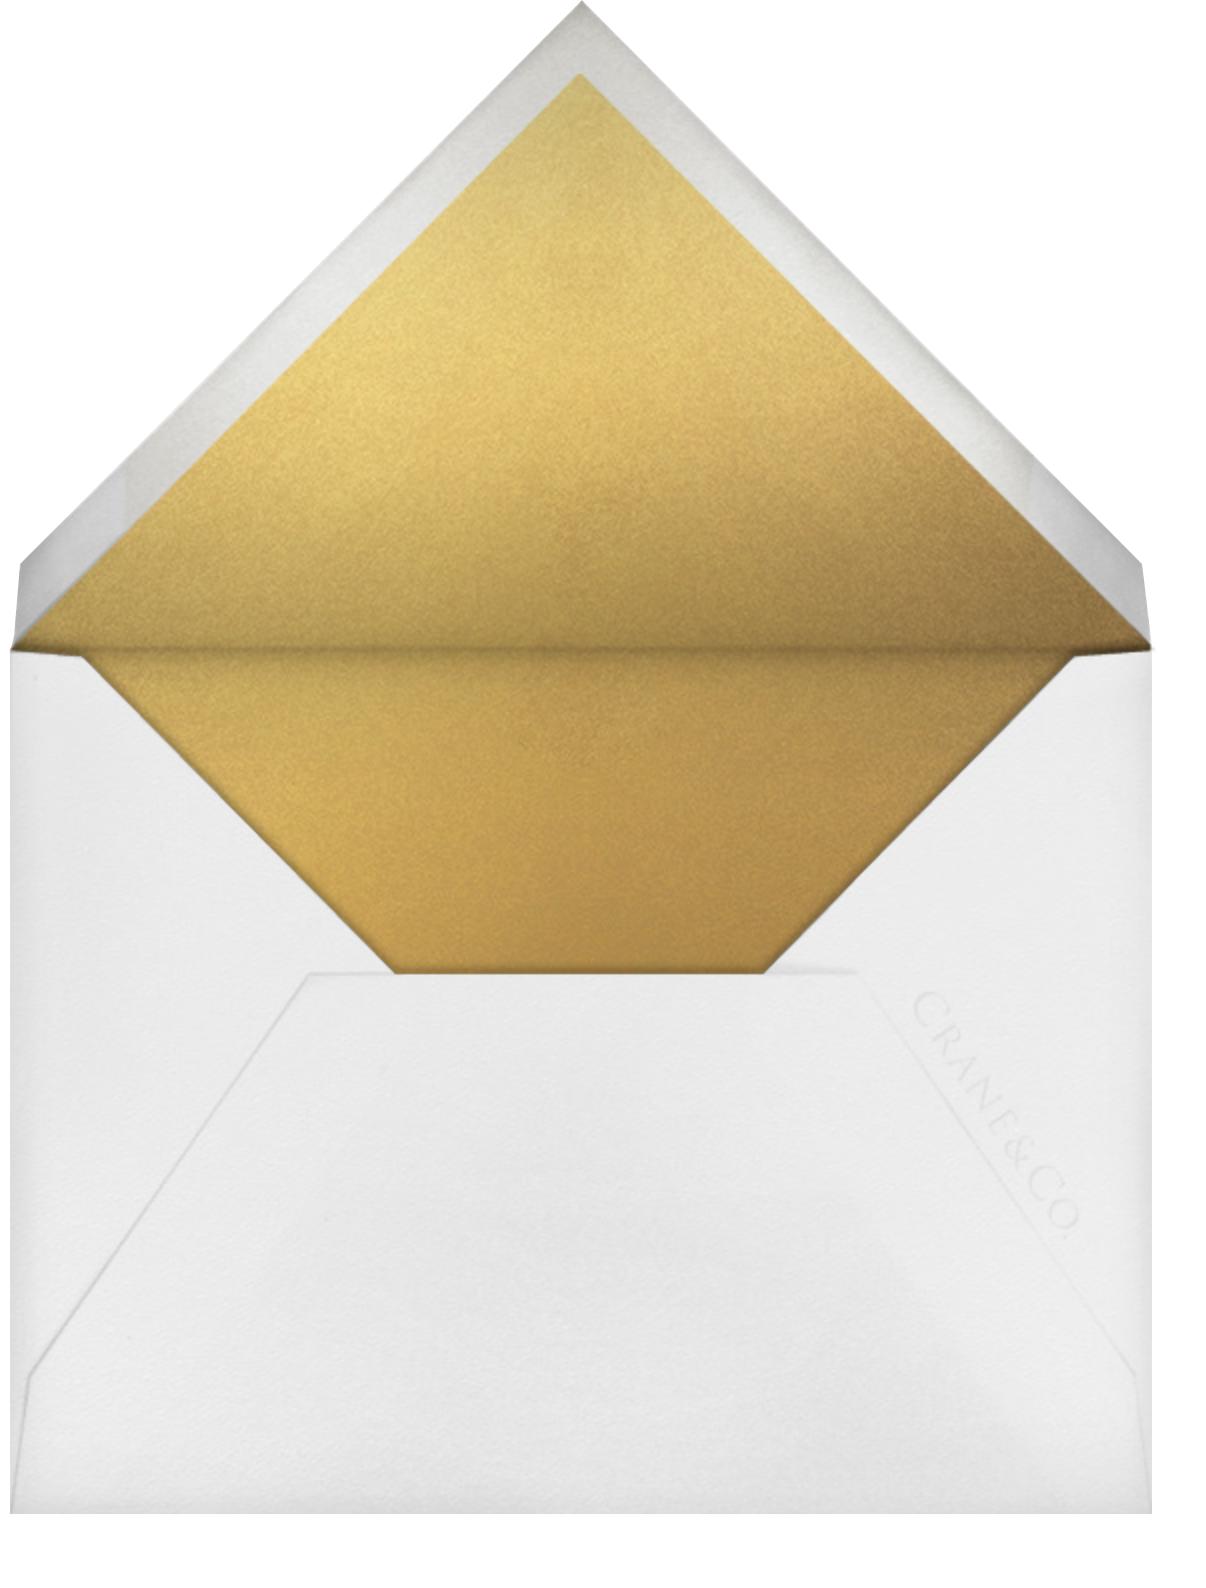 Ledger - Gold - Vera Wang - Engagement party - envelope back